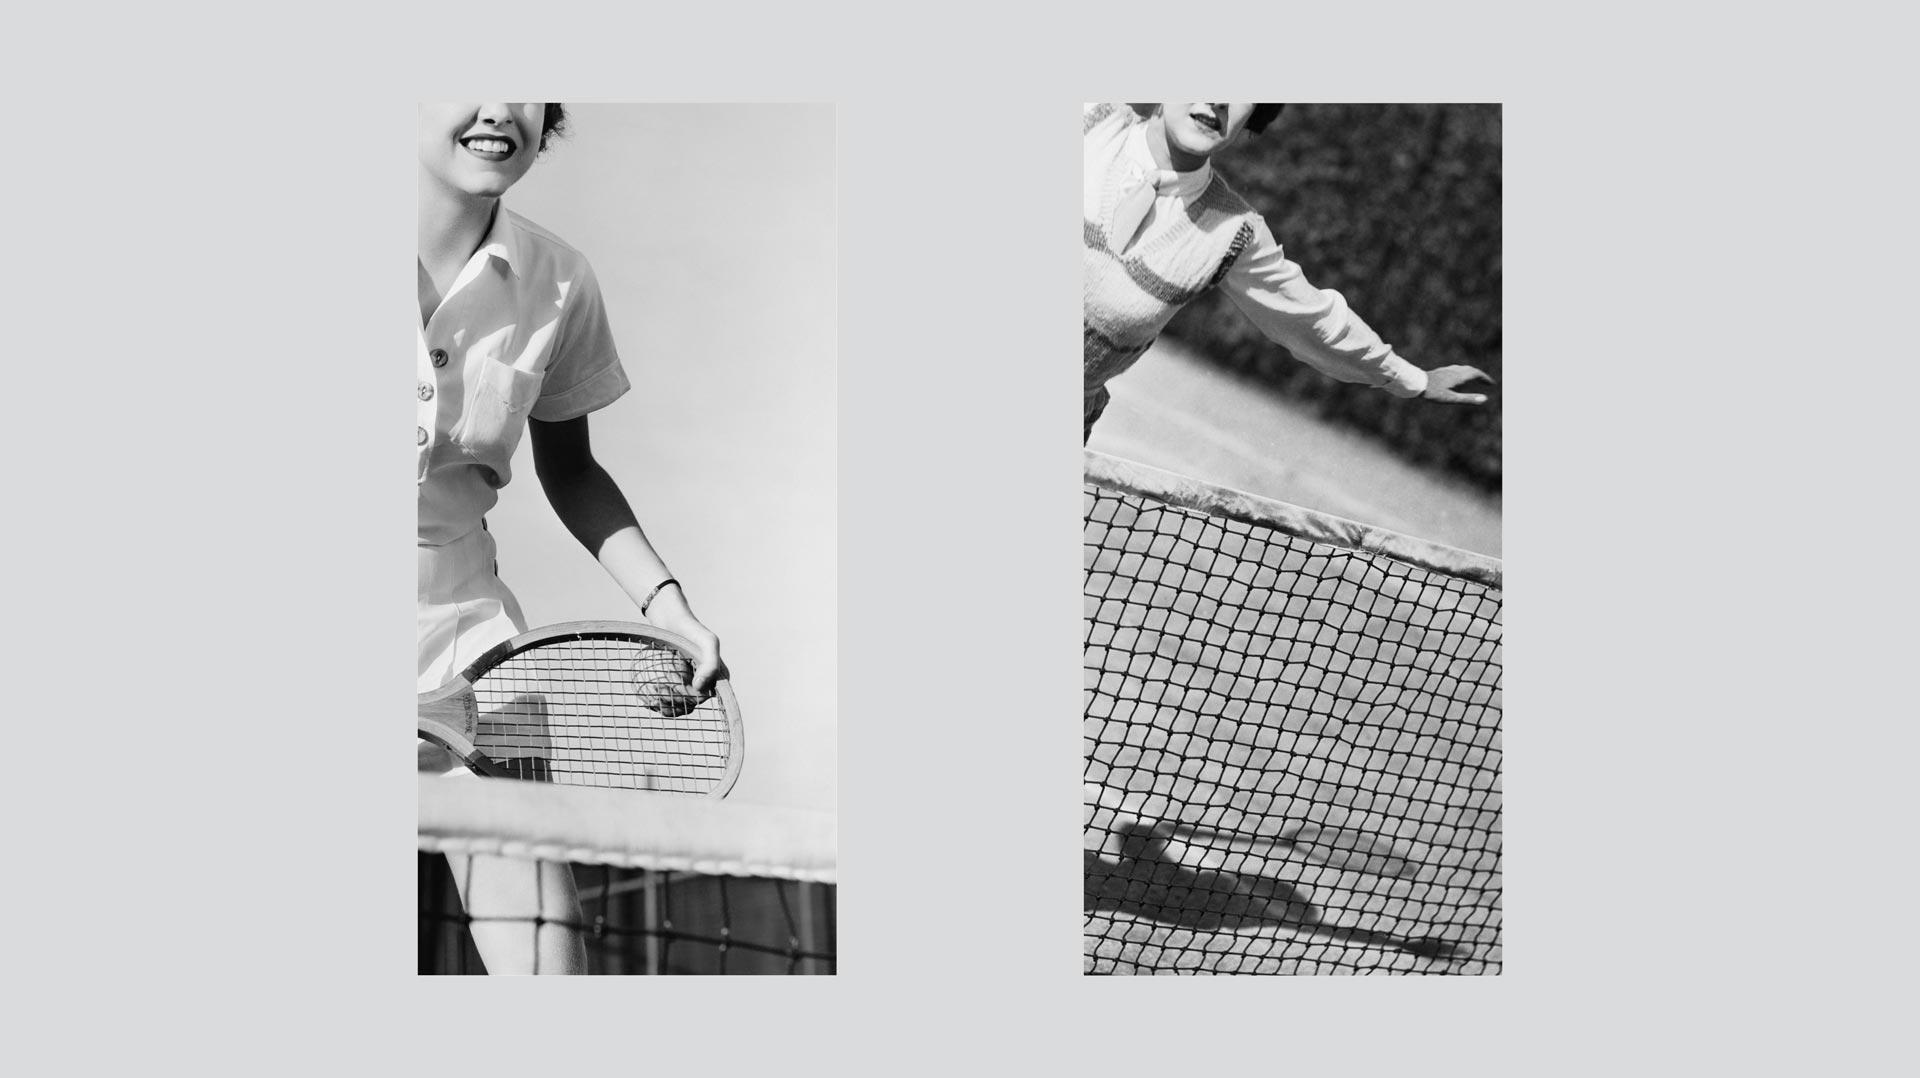 tenista-mulher-mem, tenista-mem.jpg